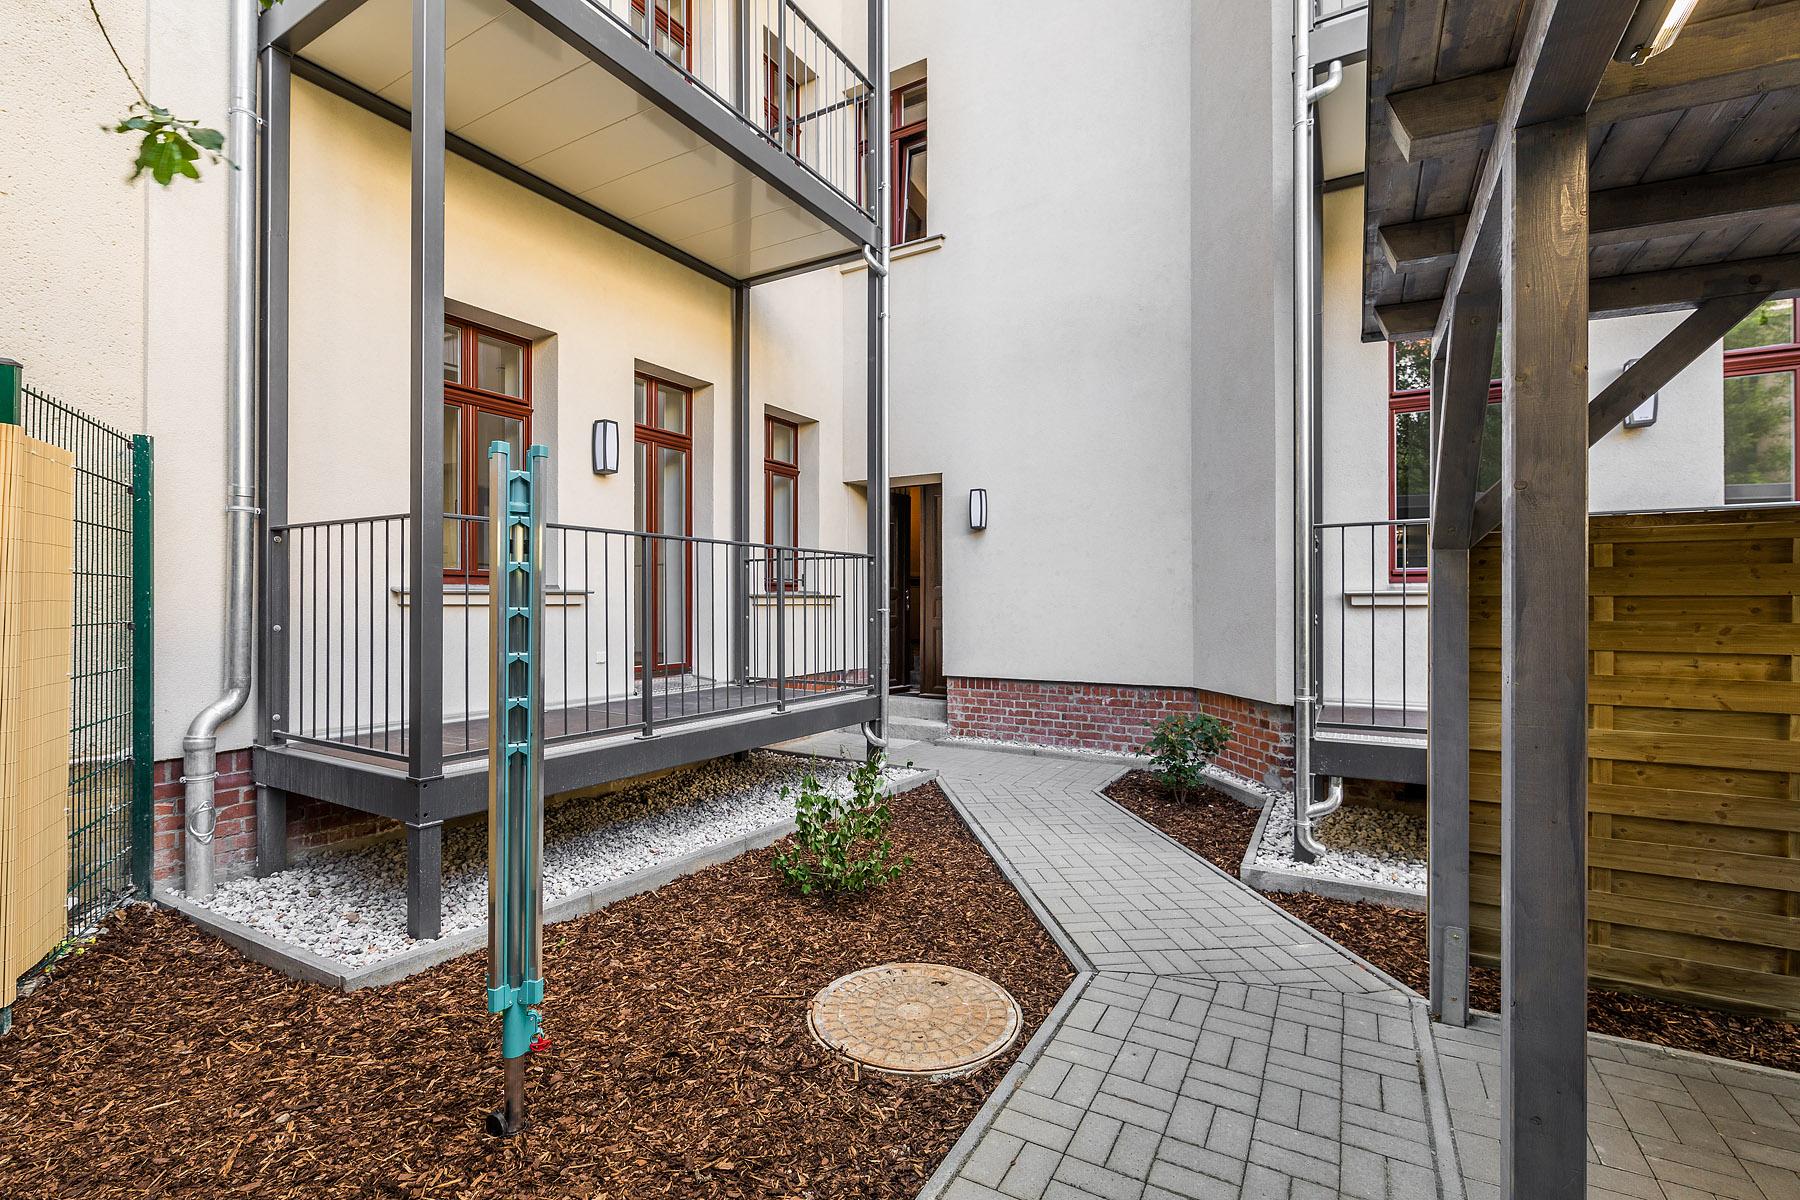 2020_konradstrasse-43-11